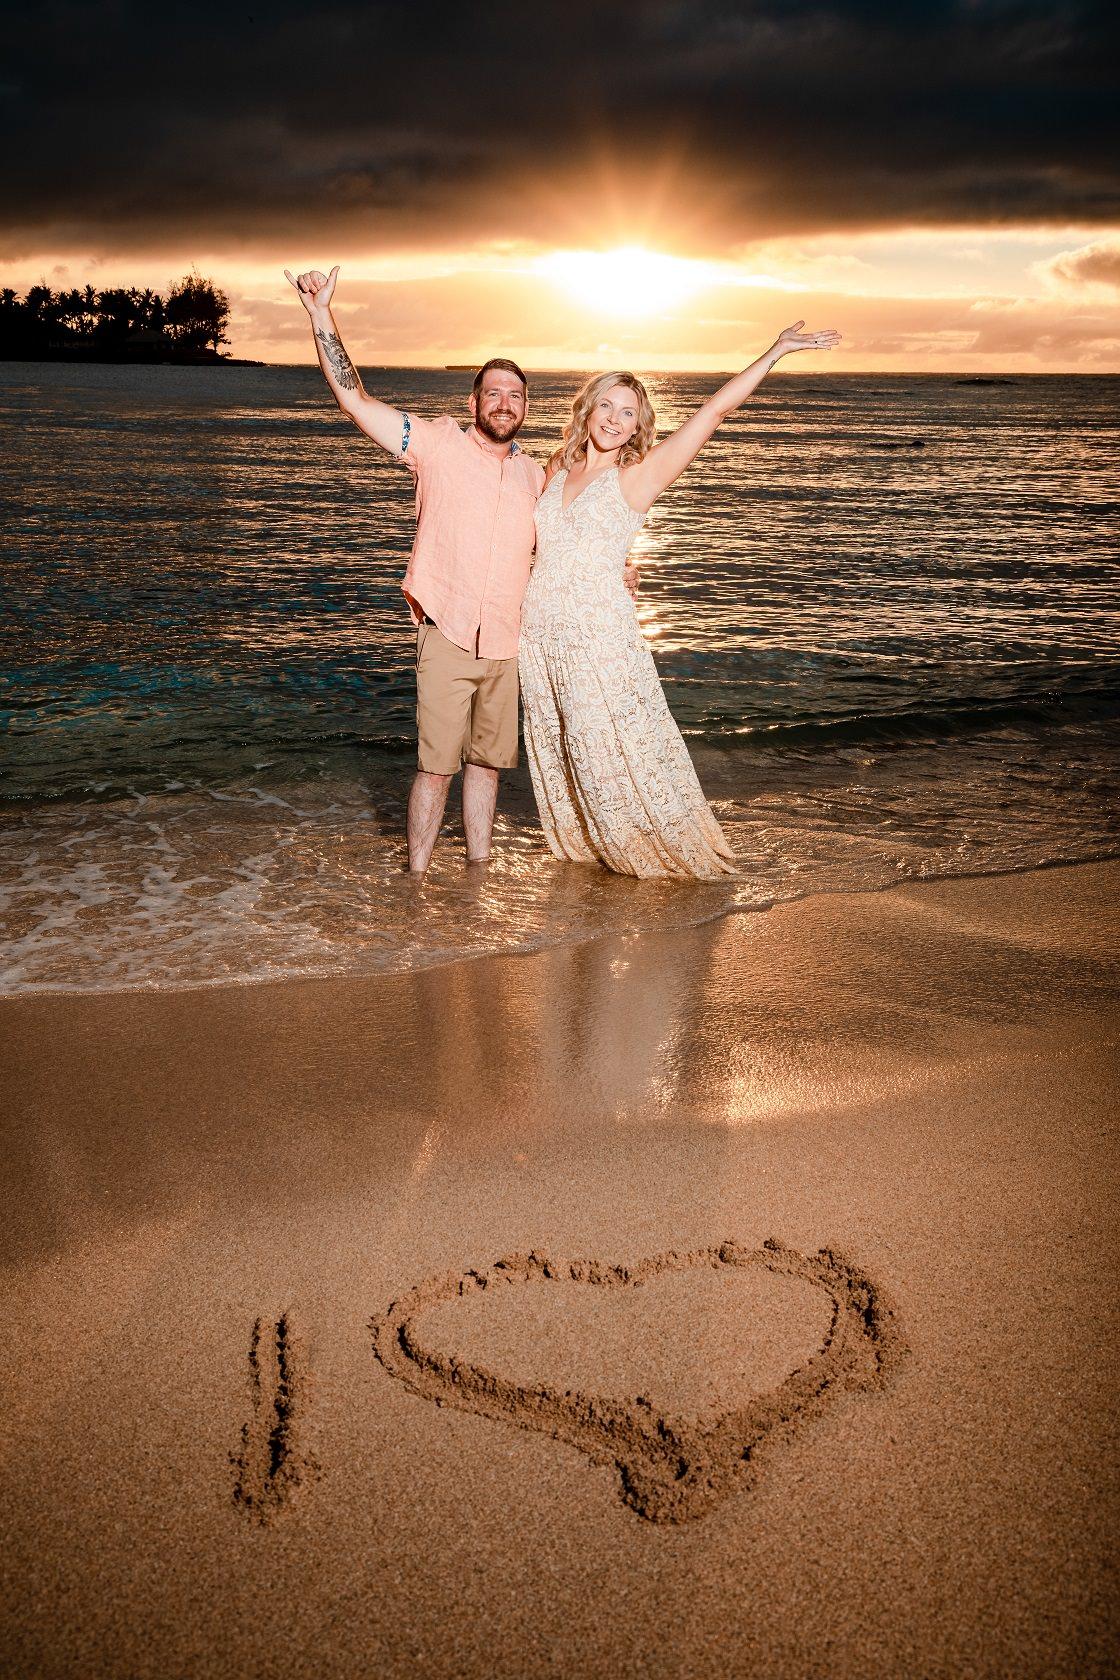 couples 10th anniversary sunset portrait